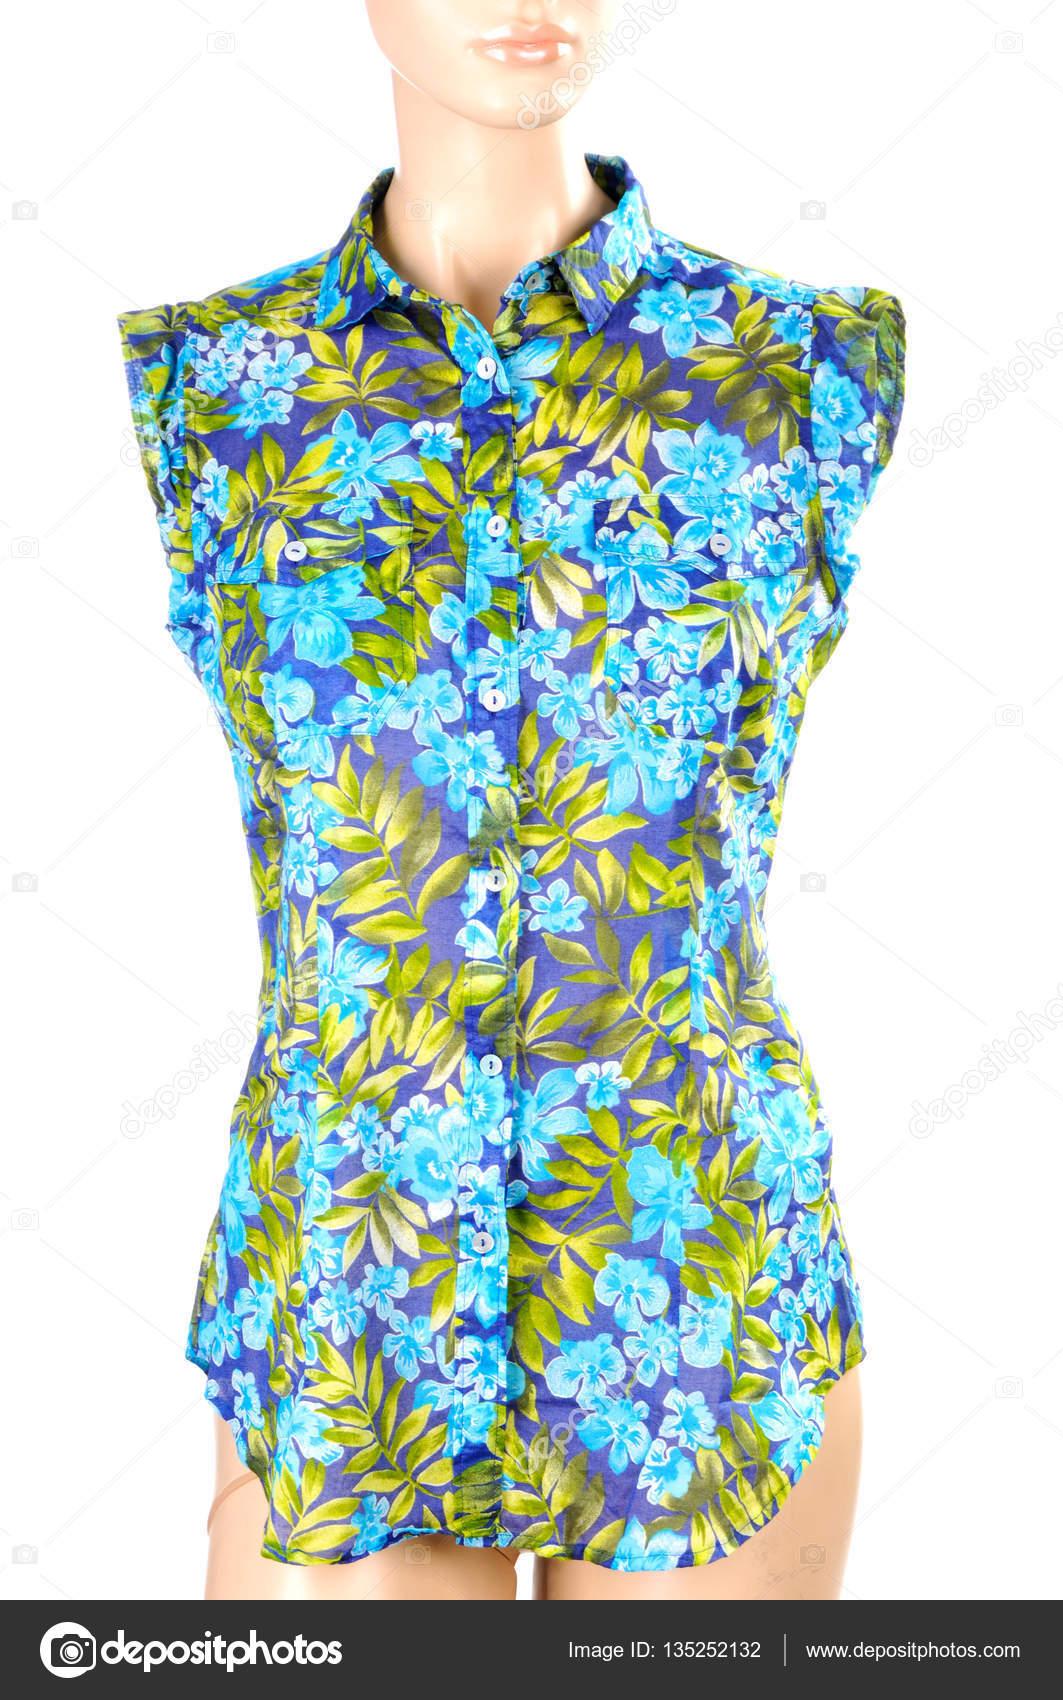 51aa4115acc9 Μπλούζα με floral τυπωμένη ύλη που απομονώνονται σε λευκό. λουλούδι εμπριμέ  φόρεμα-ζακέτα σε ένα μανεκέν — Εικόνα από ...